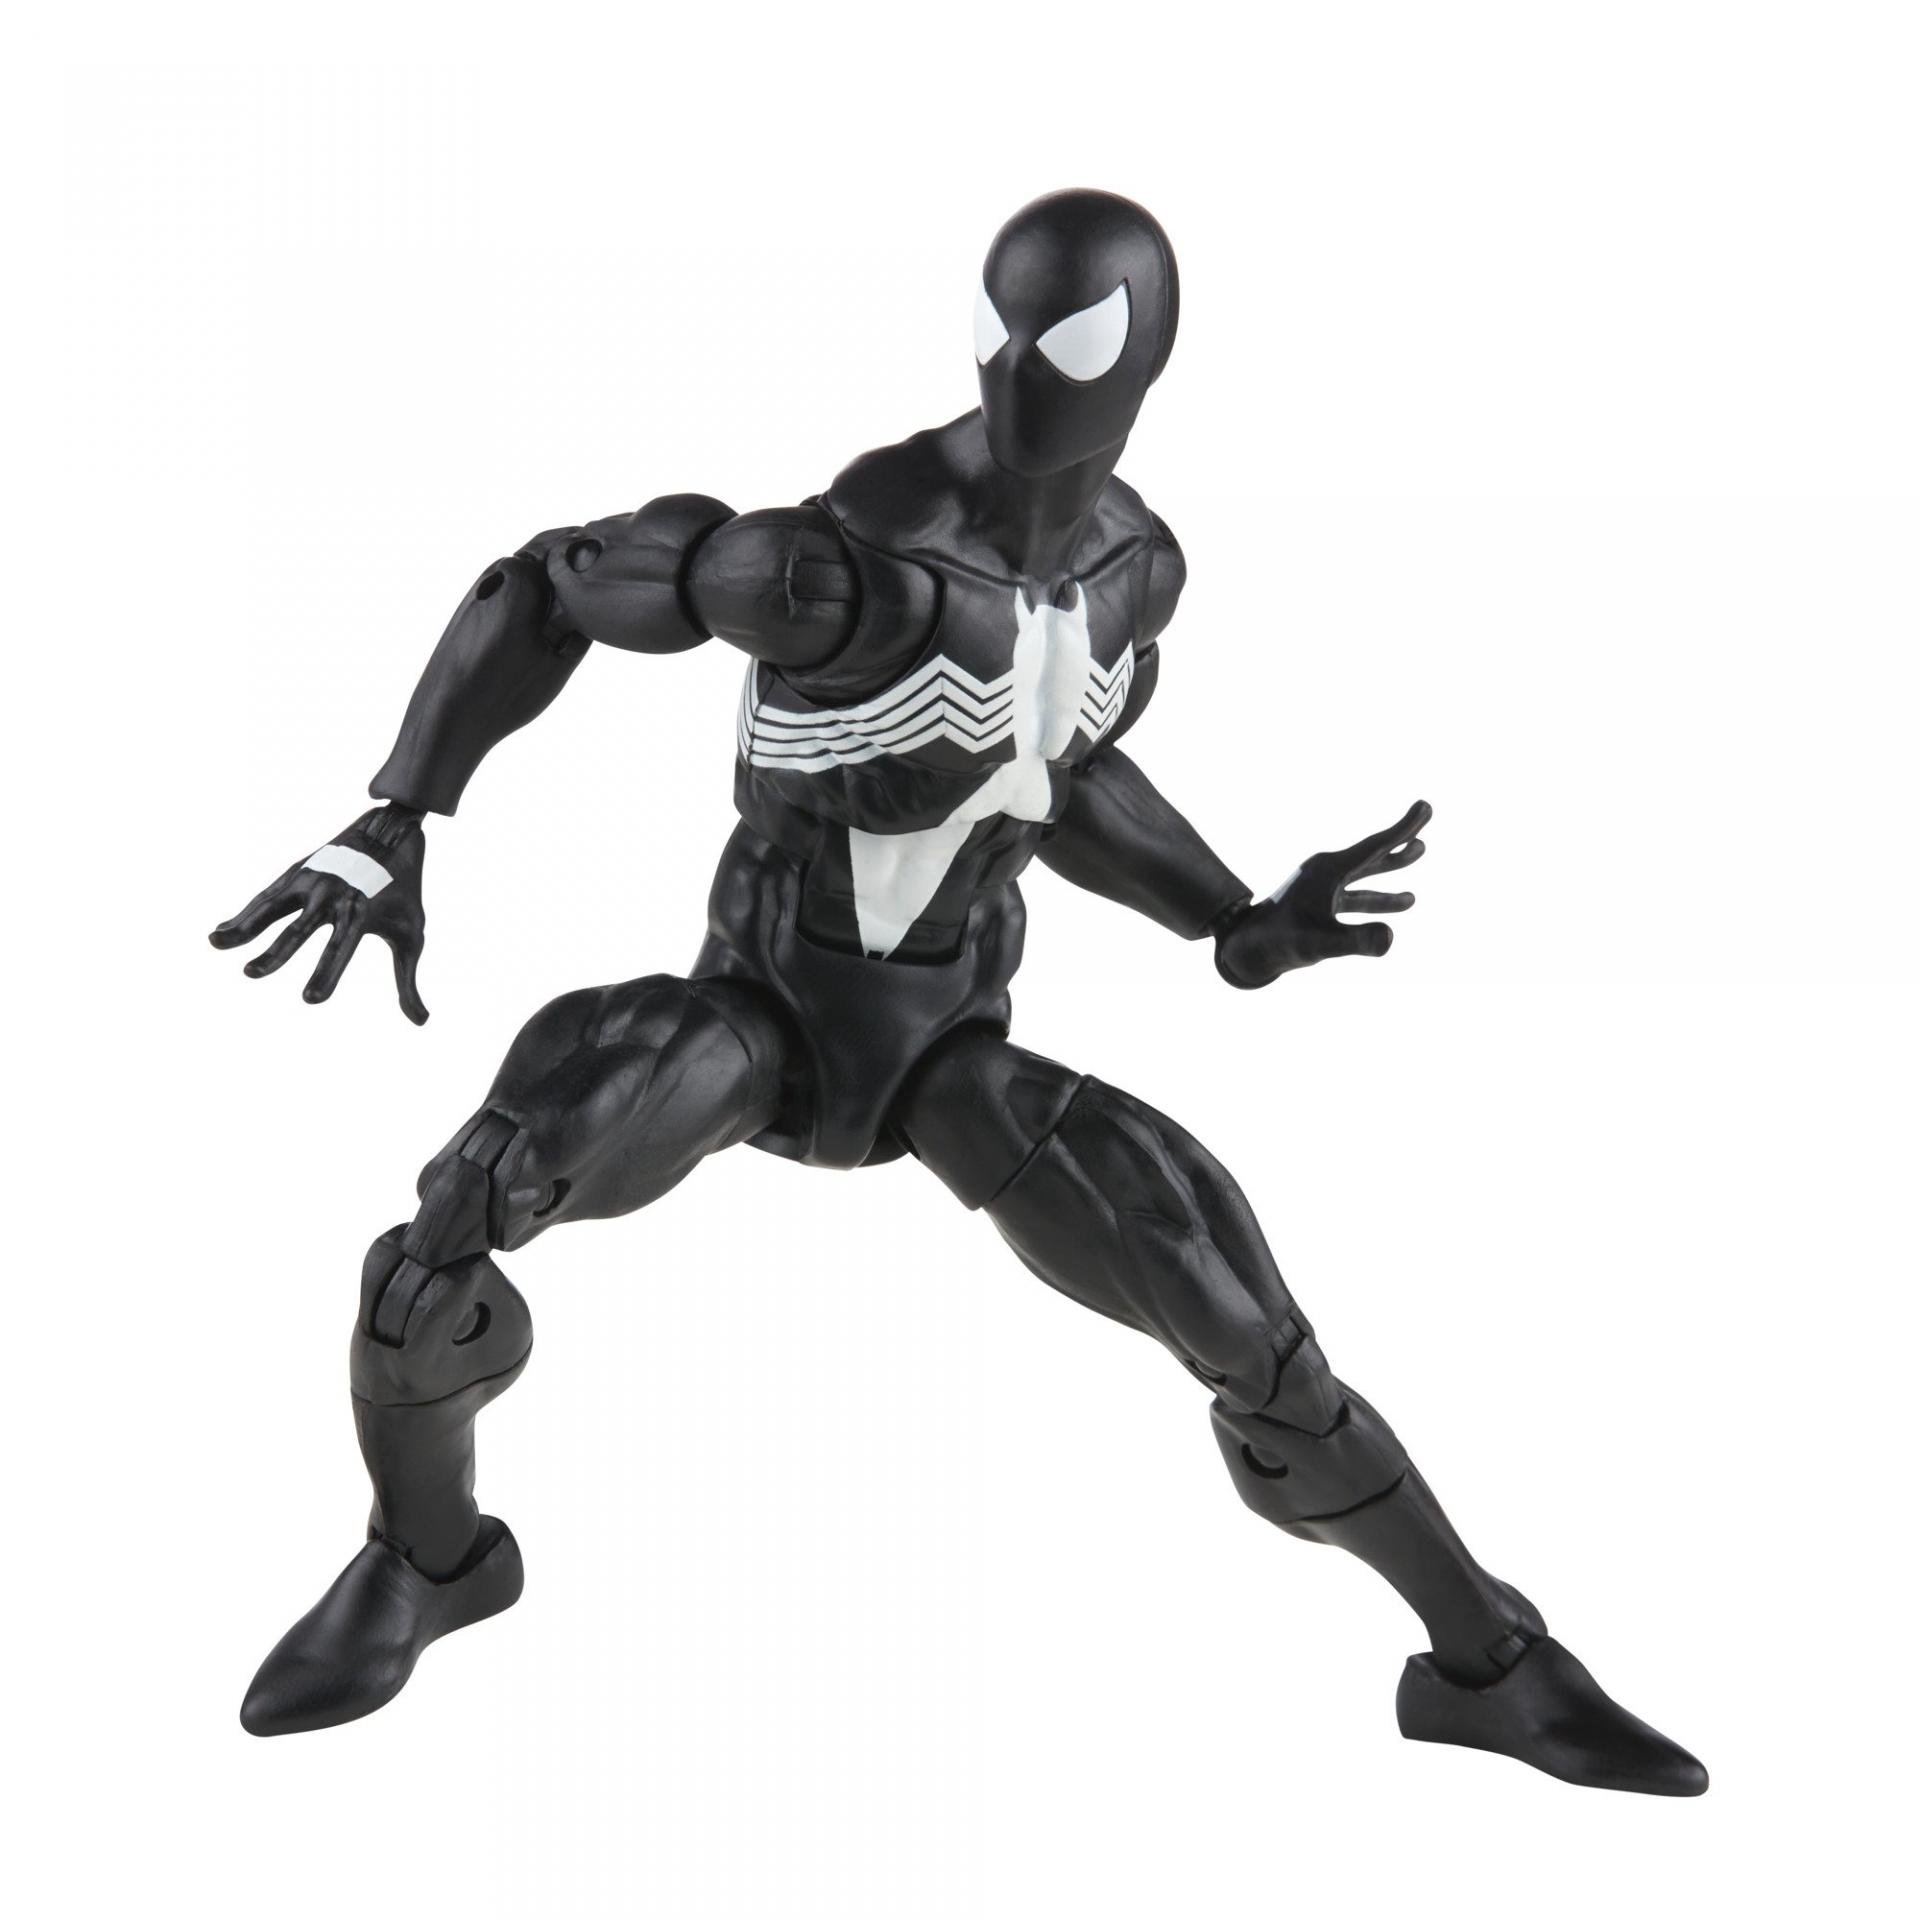 Marvel legends series hasbro symbiote spider man5